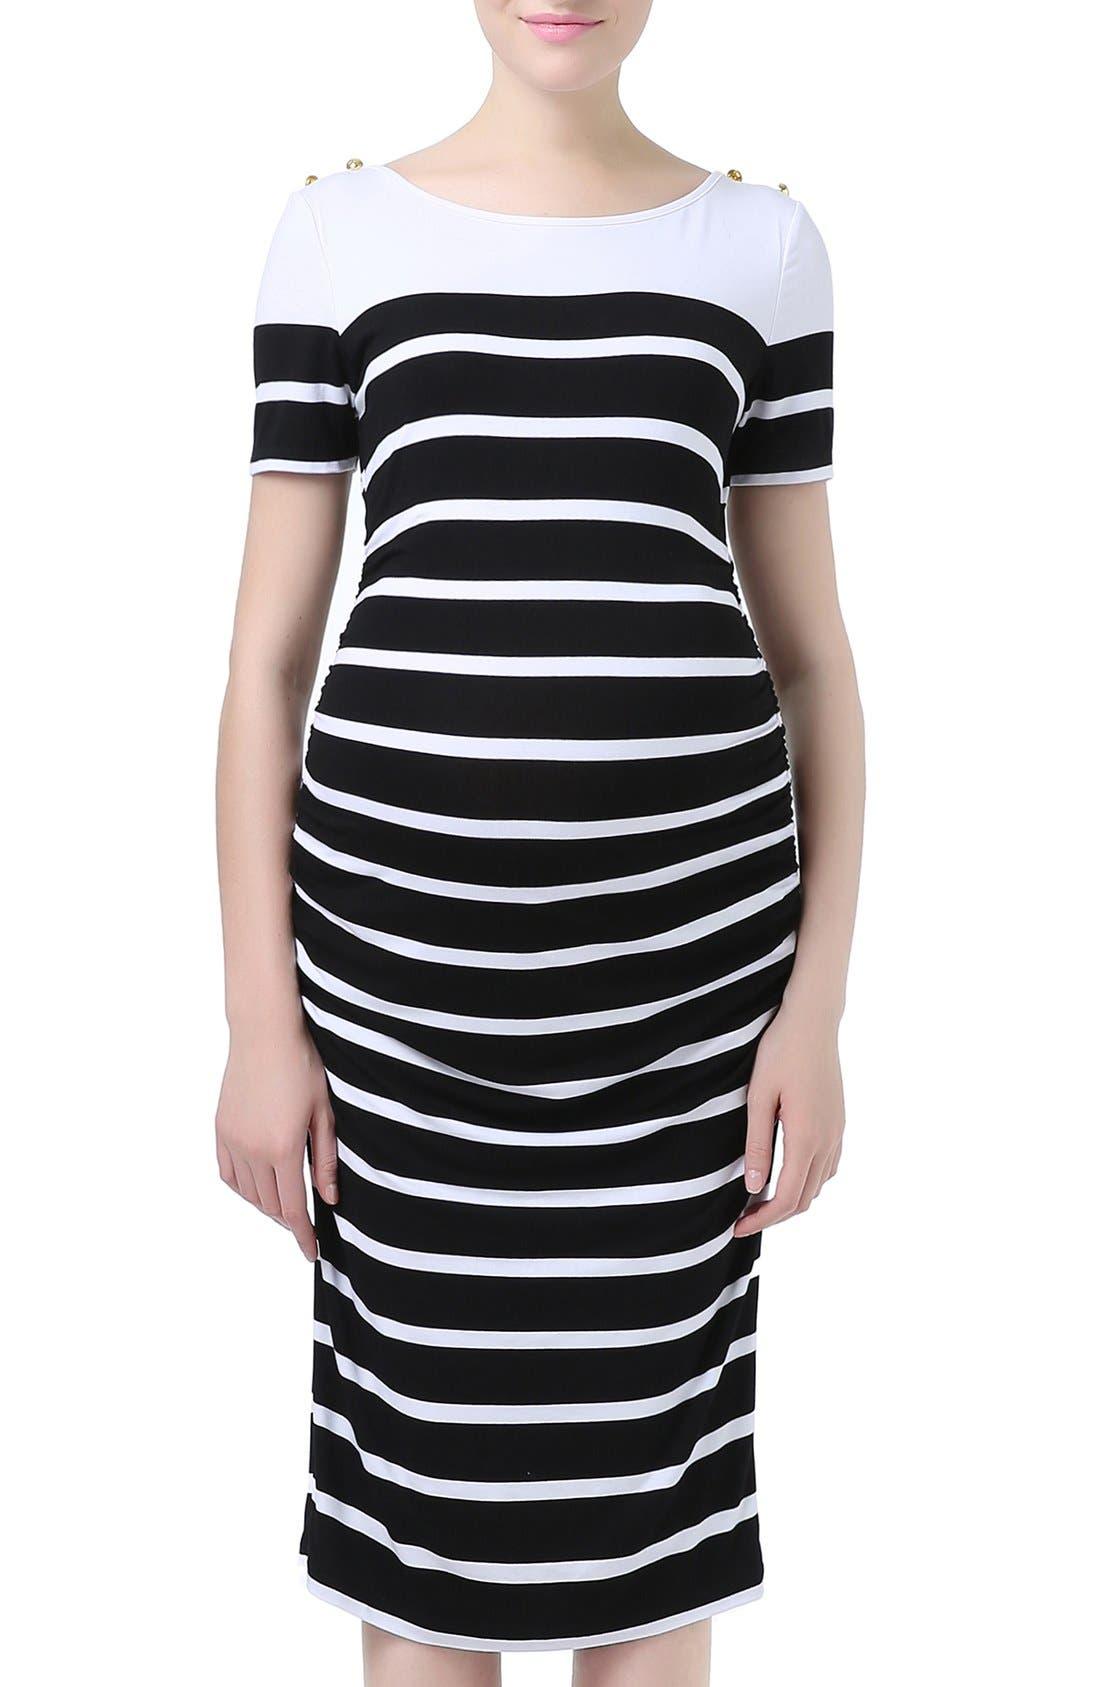 KIMI AND KAI 'Marina' Stripe Boatneck Maternity Dress